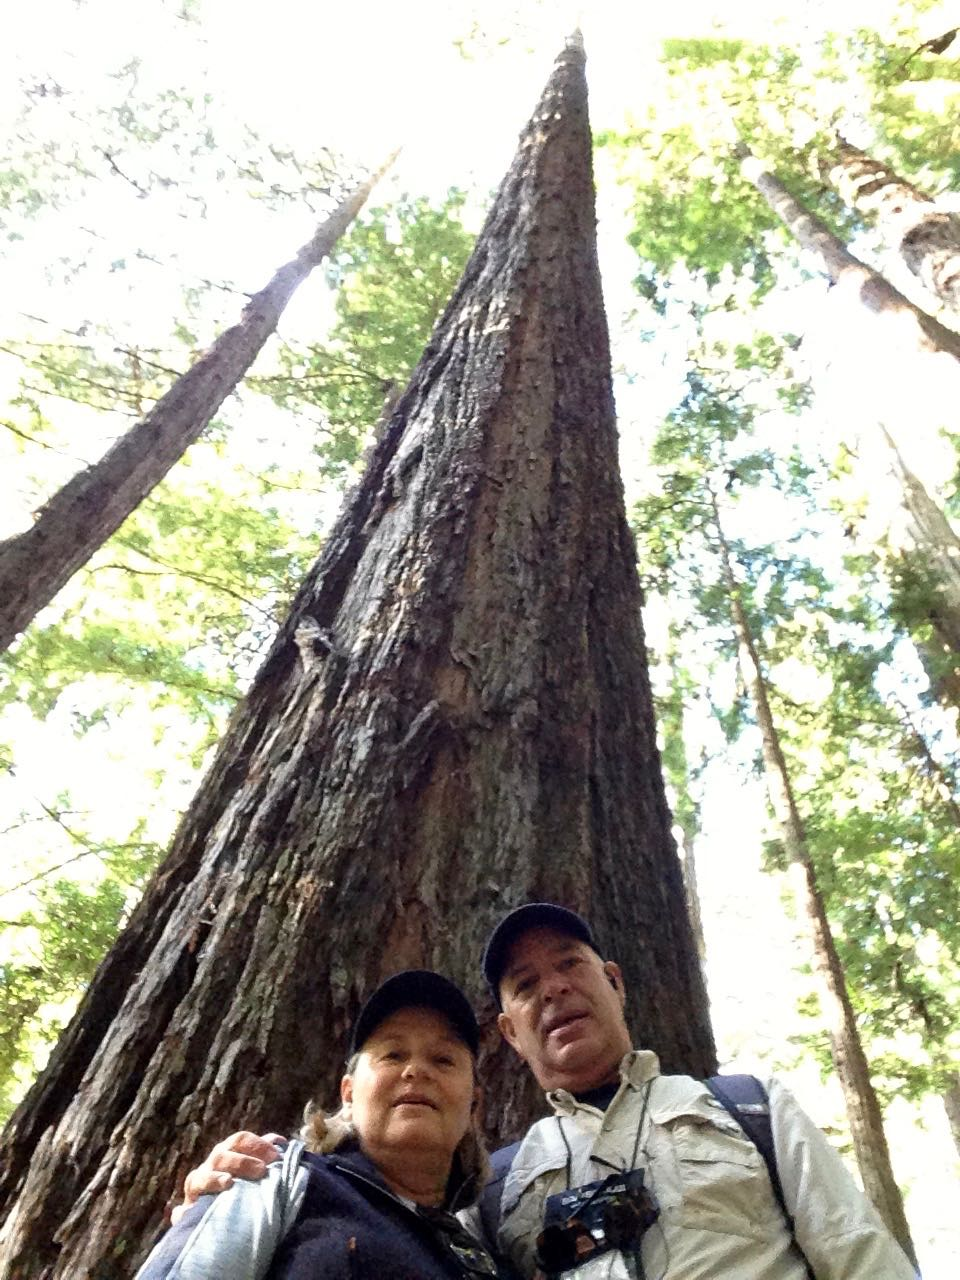 Redwoods 2017 10 08 215 Of 287